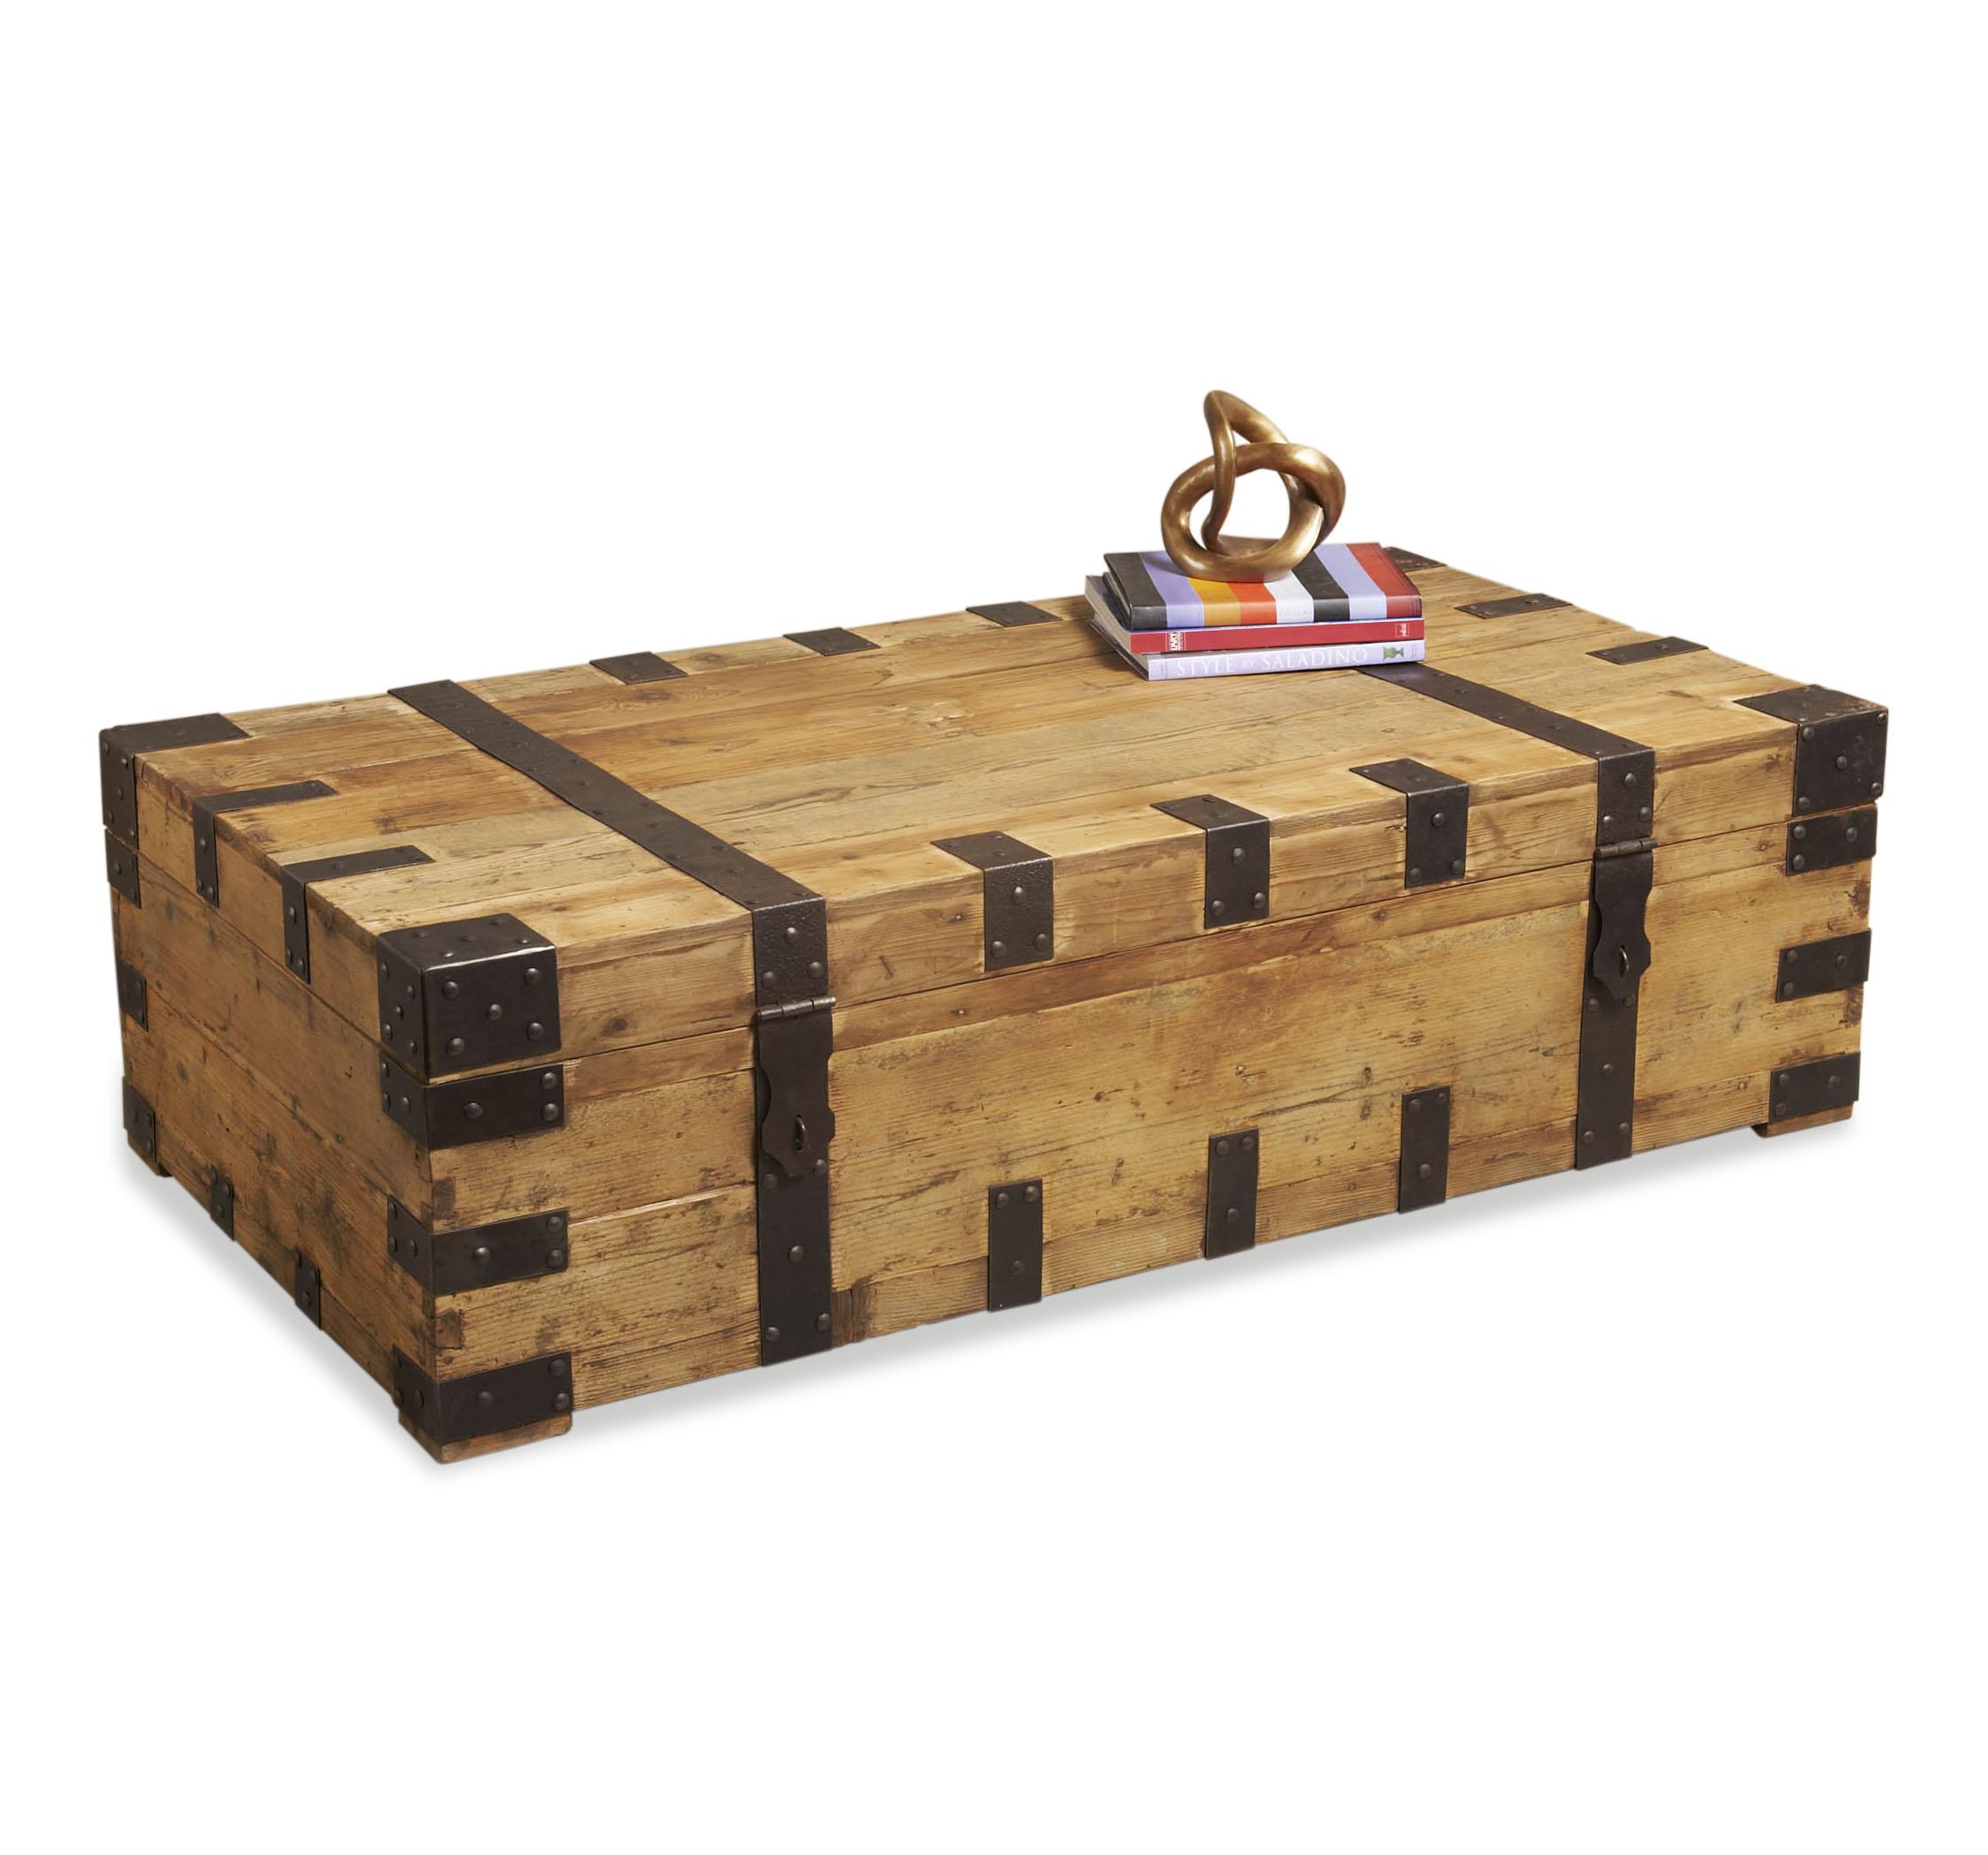 gaston large rustic wood iron coffee table trunk